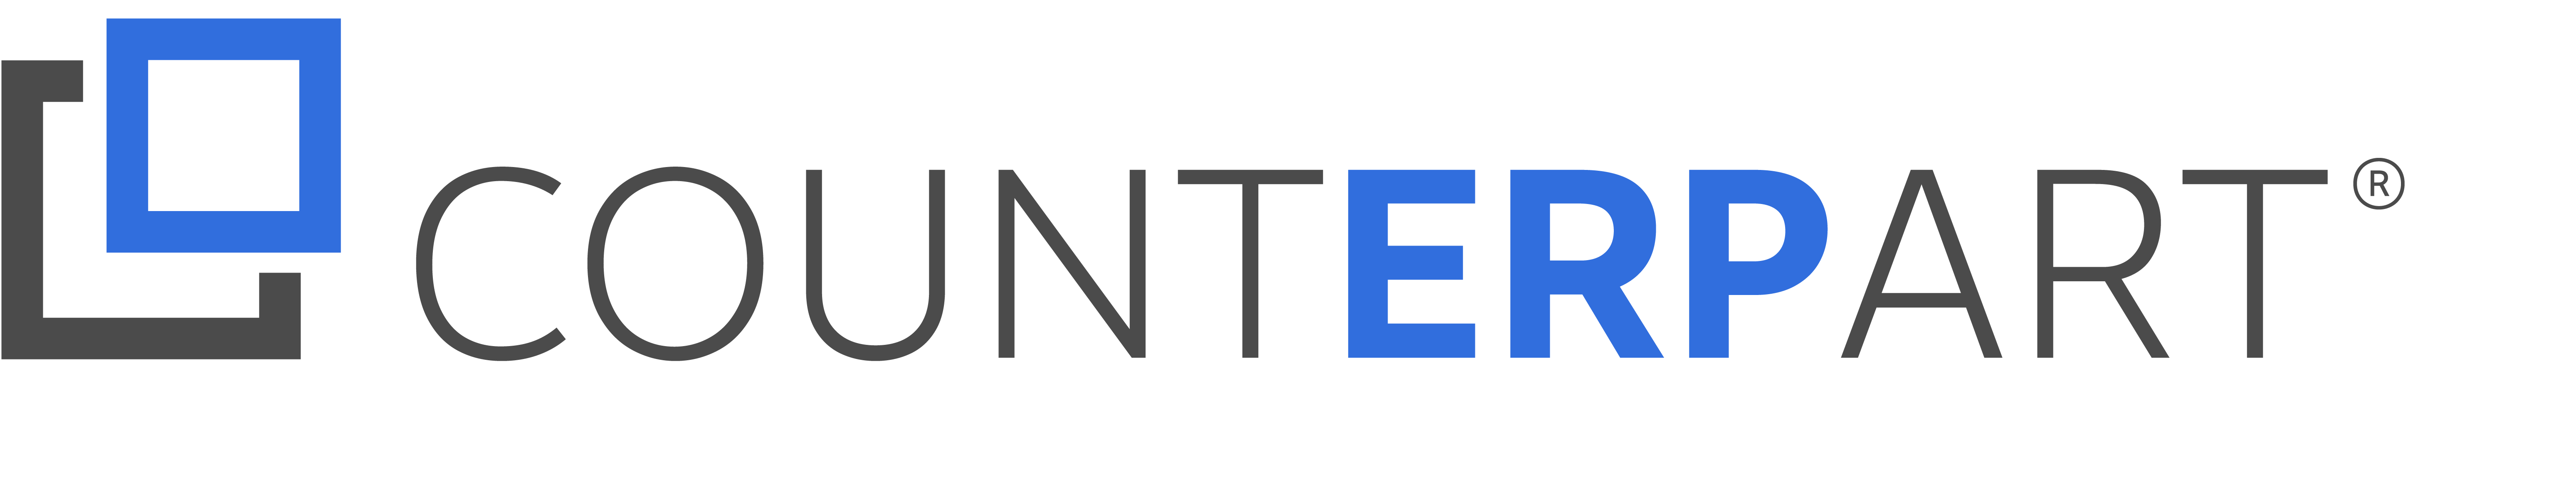 ETO ERP Leader COUNTERPART Includes Team Member Michael Herbst